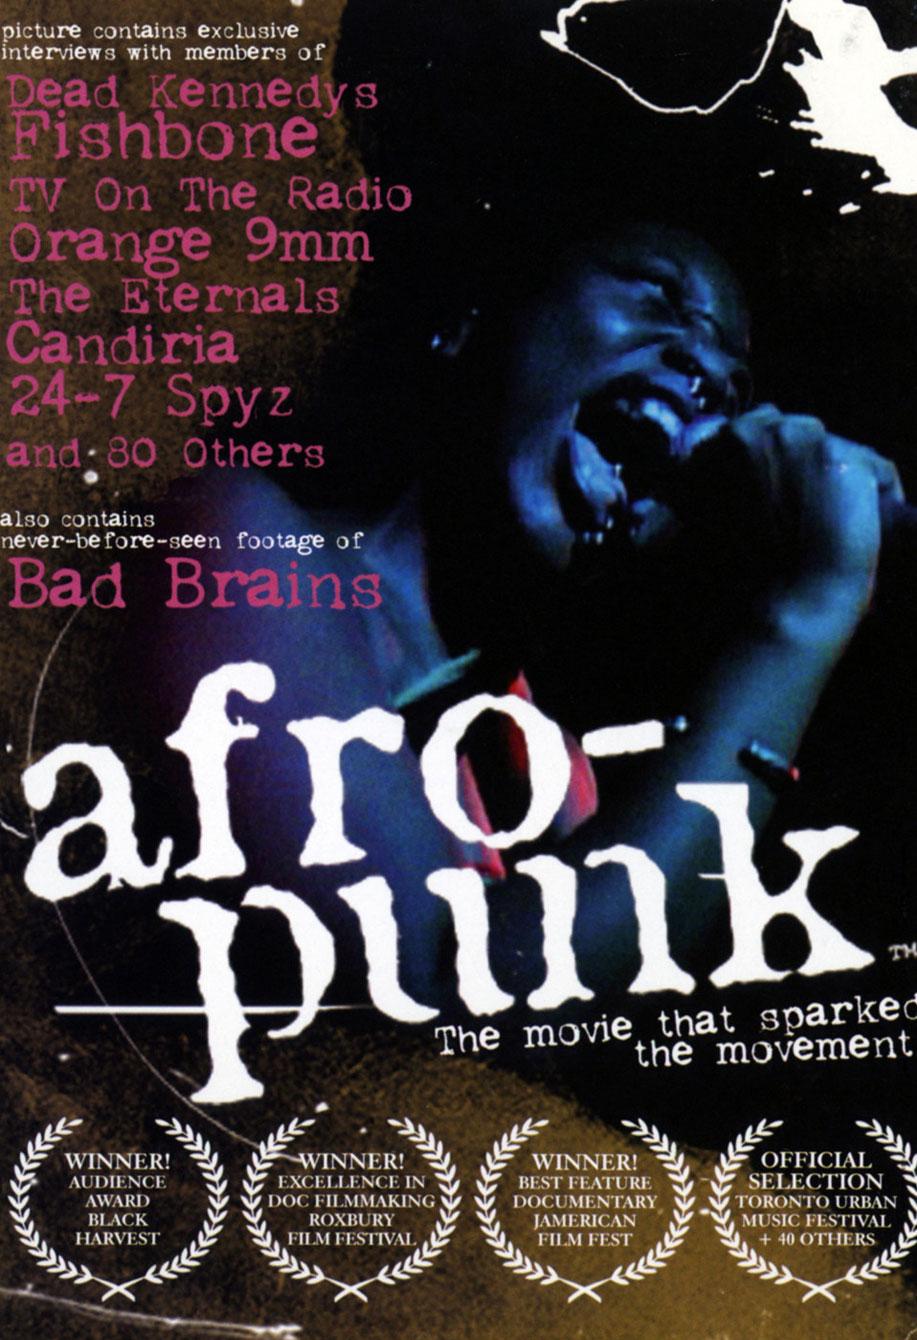 AFROPUNK DOCUMENTARY 2007 - Film, Music & Soundtrack